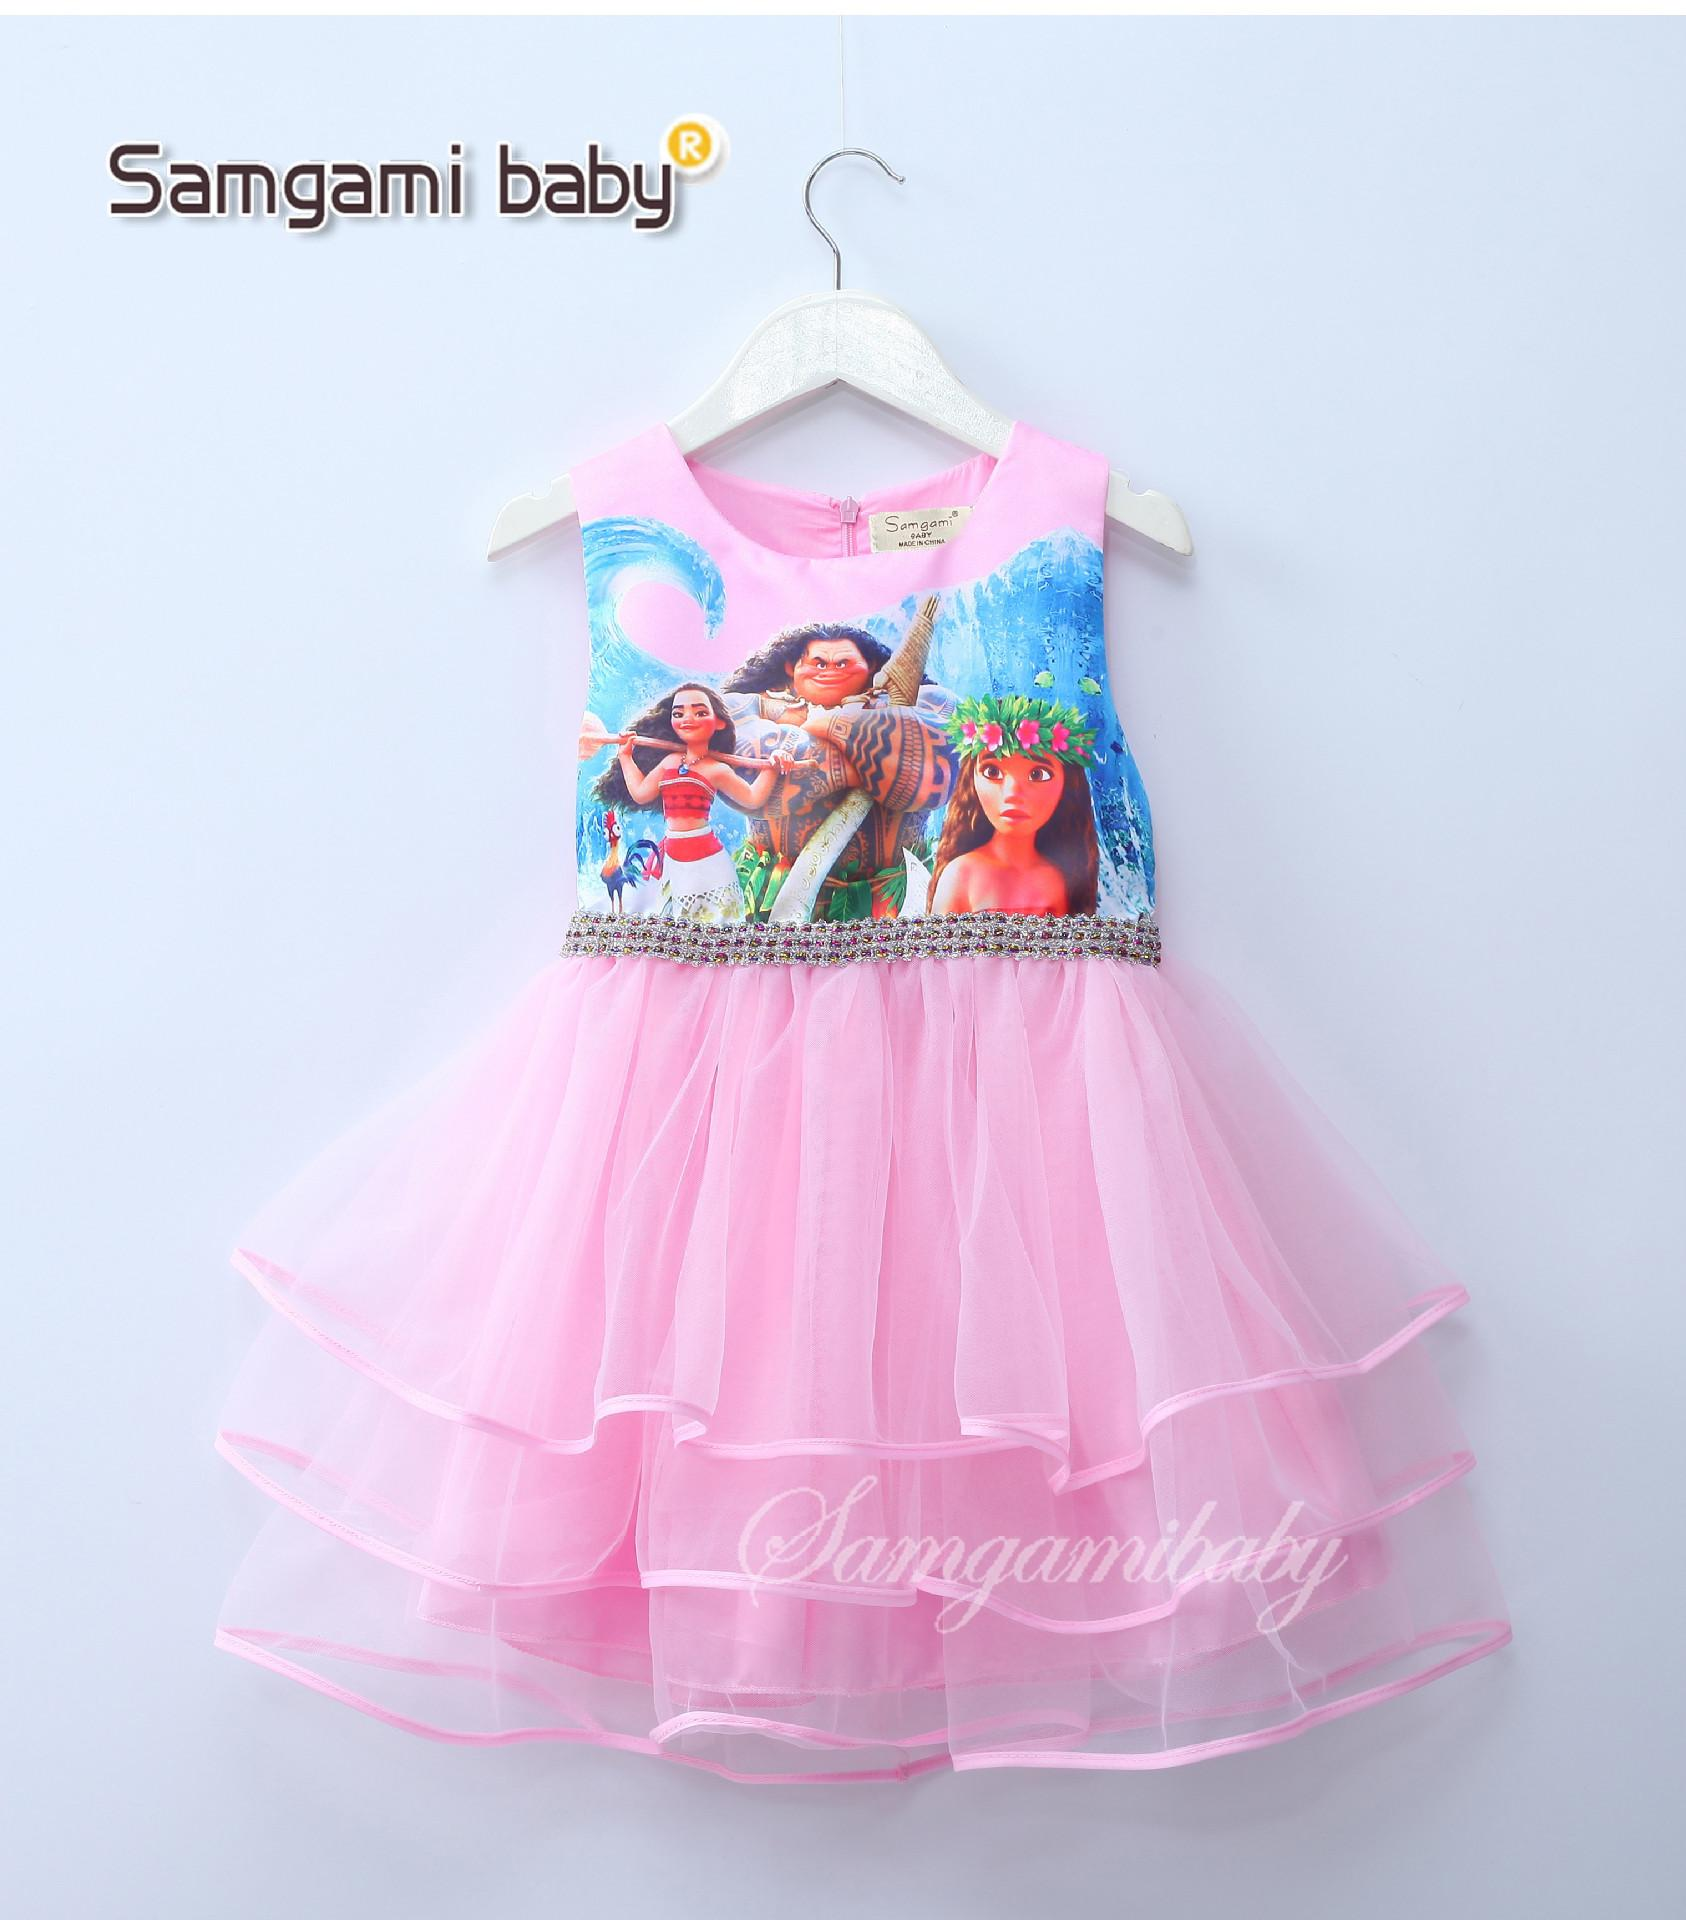 Großhandel Mädchen Moana Prinzessin Kleid Lila Rapunzel Kleid Kinder ...